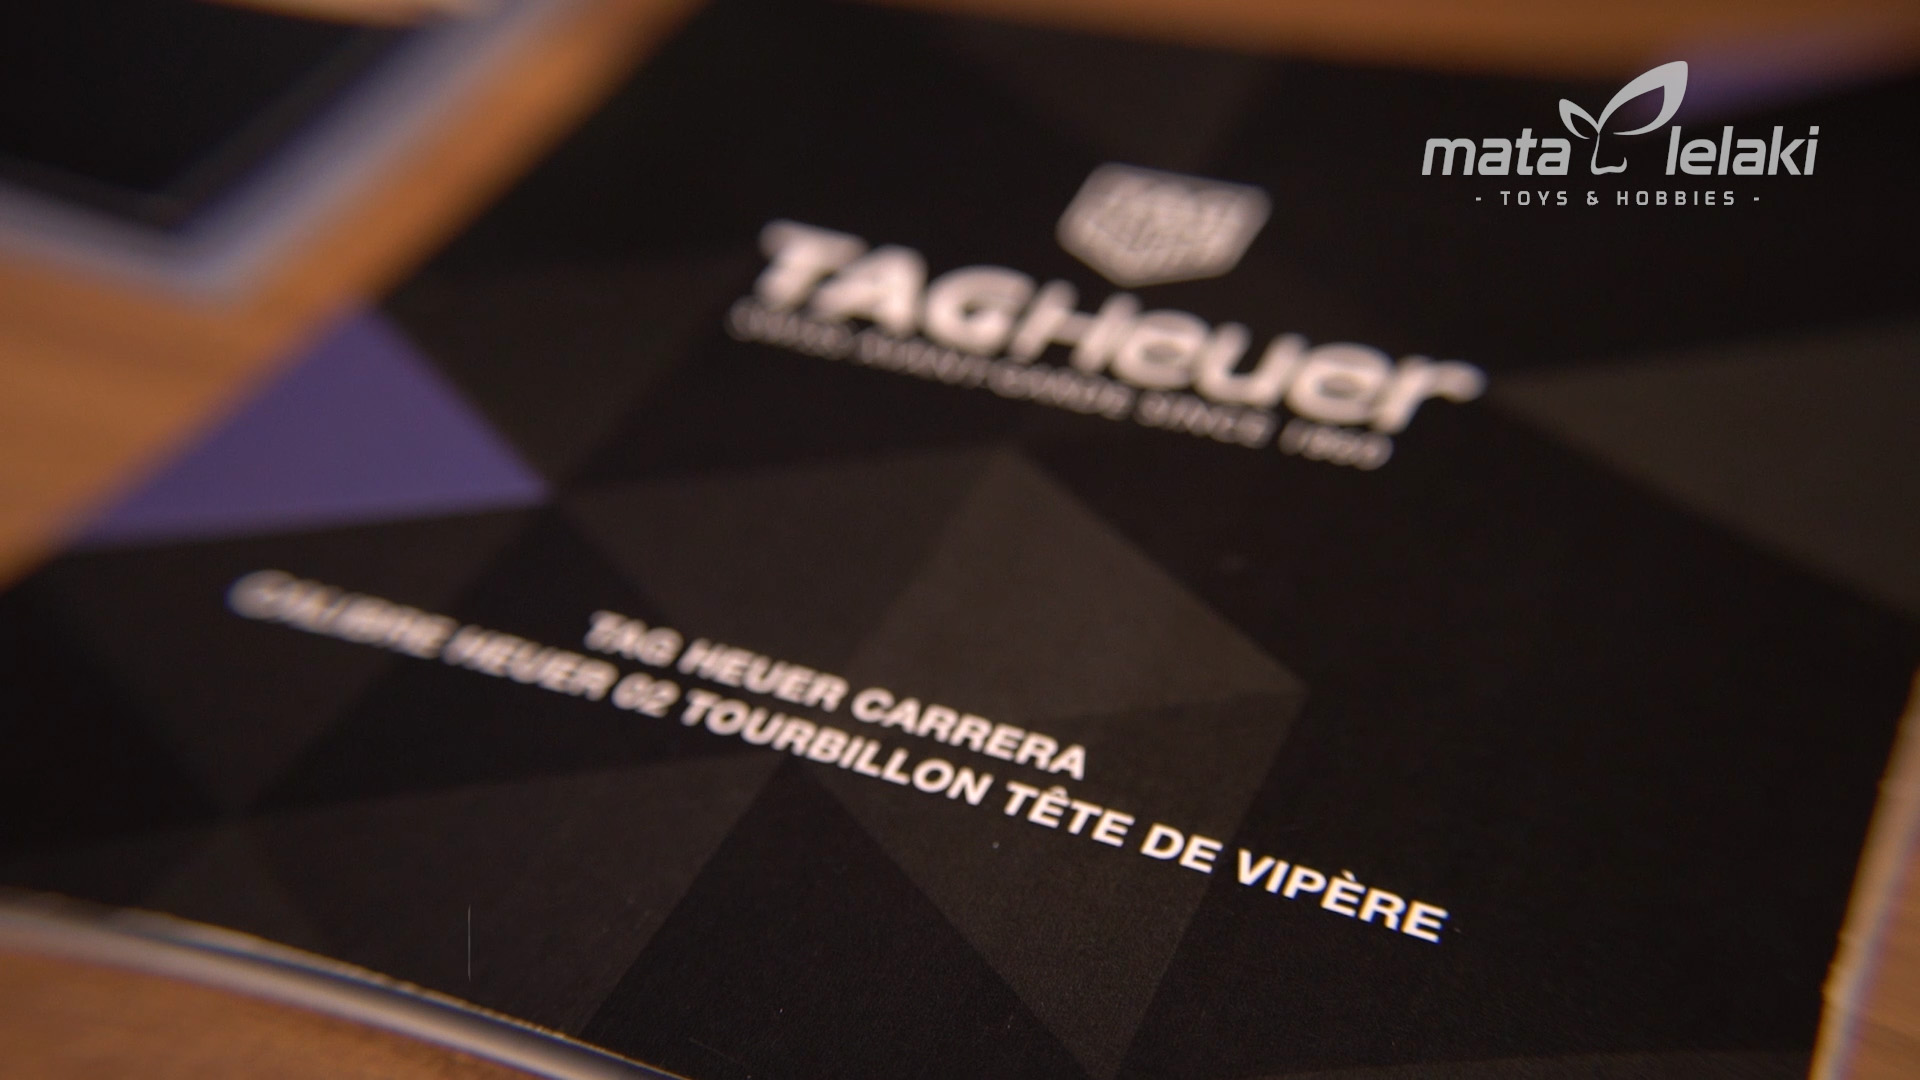 TAG Heuer Carrera 'Tete de Vipere' : Sertifikasi Tertinggi, Hanya Di Pasarkan 155 Unit Di Dunia